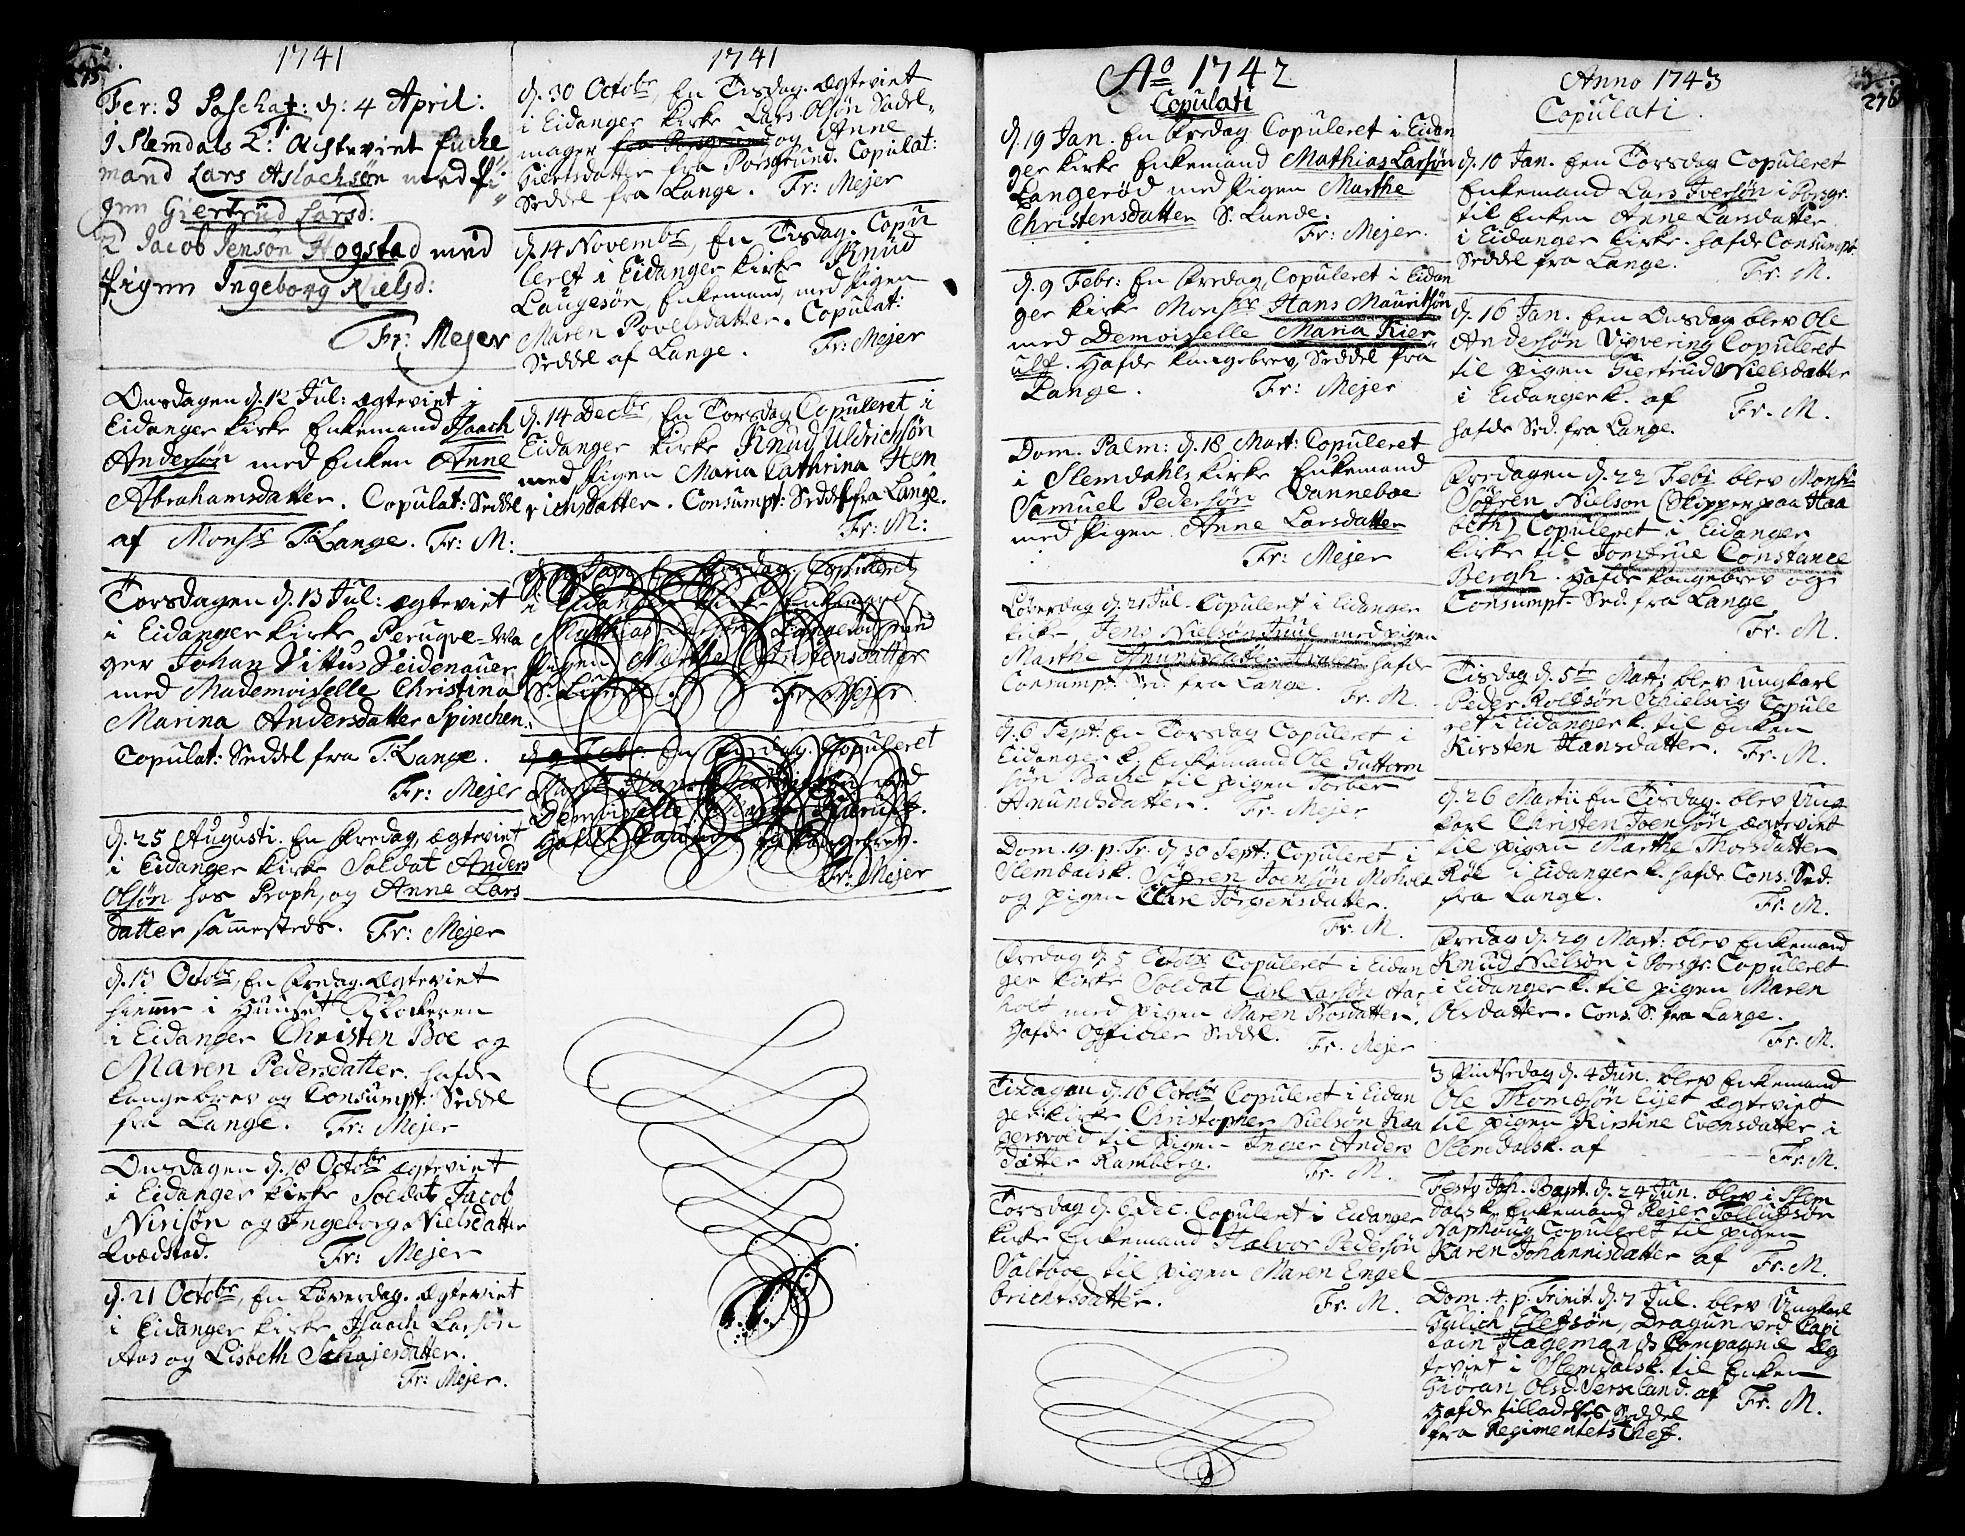 SAKO, Eidanger kirkebøker, F/Fa/L0004: Parish register (official) no. 4, 1733-1759, p. 275-276